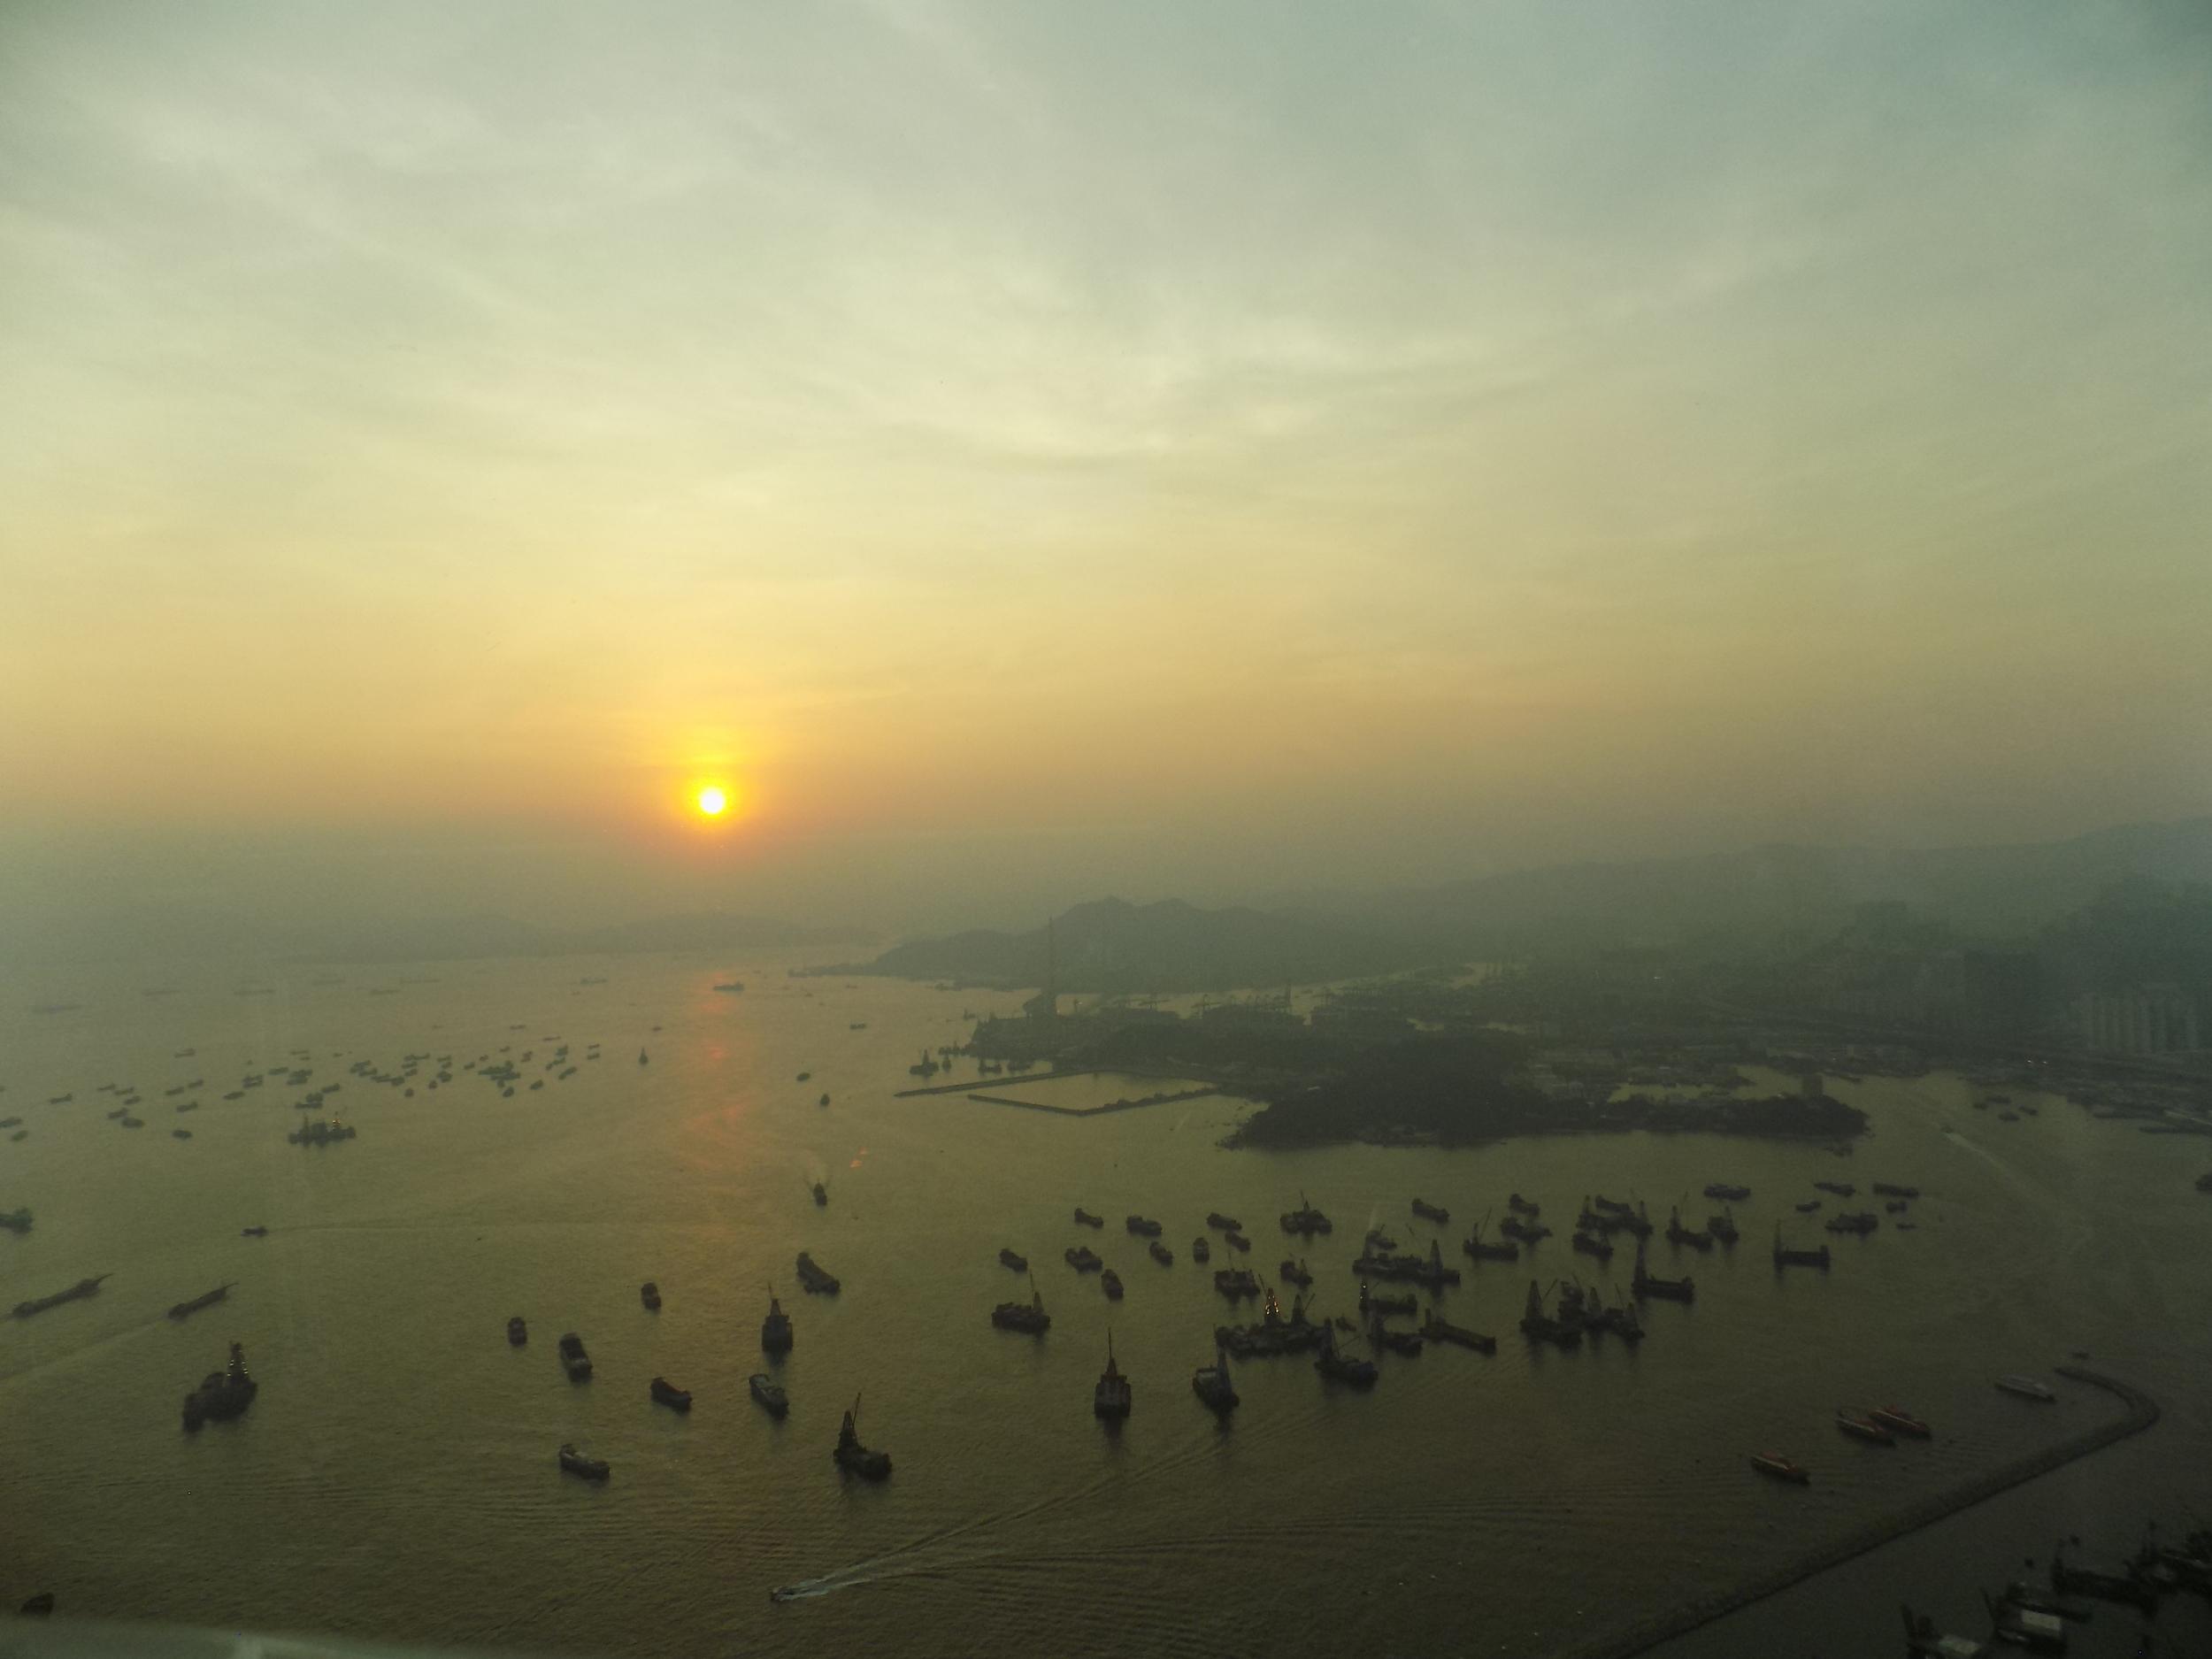 8/8 - Hong Kong